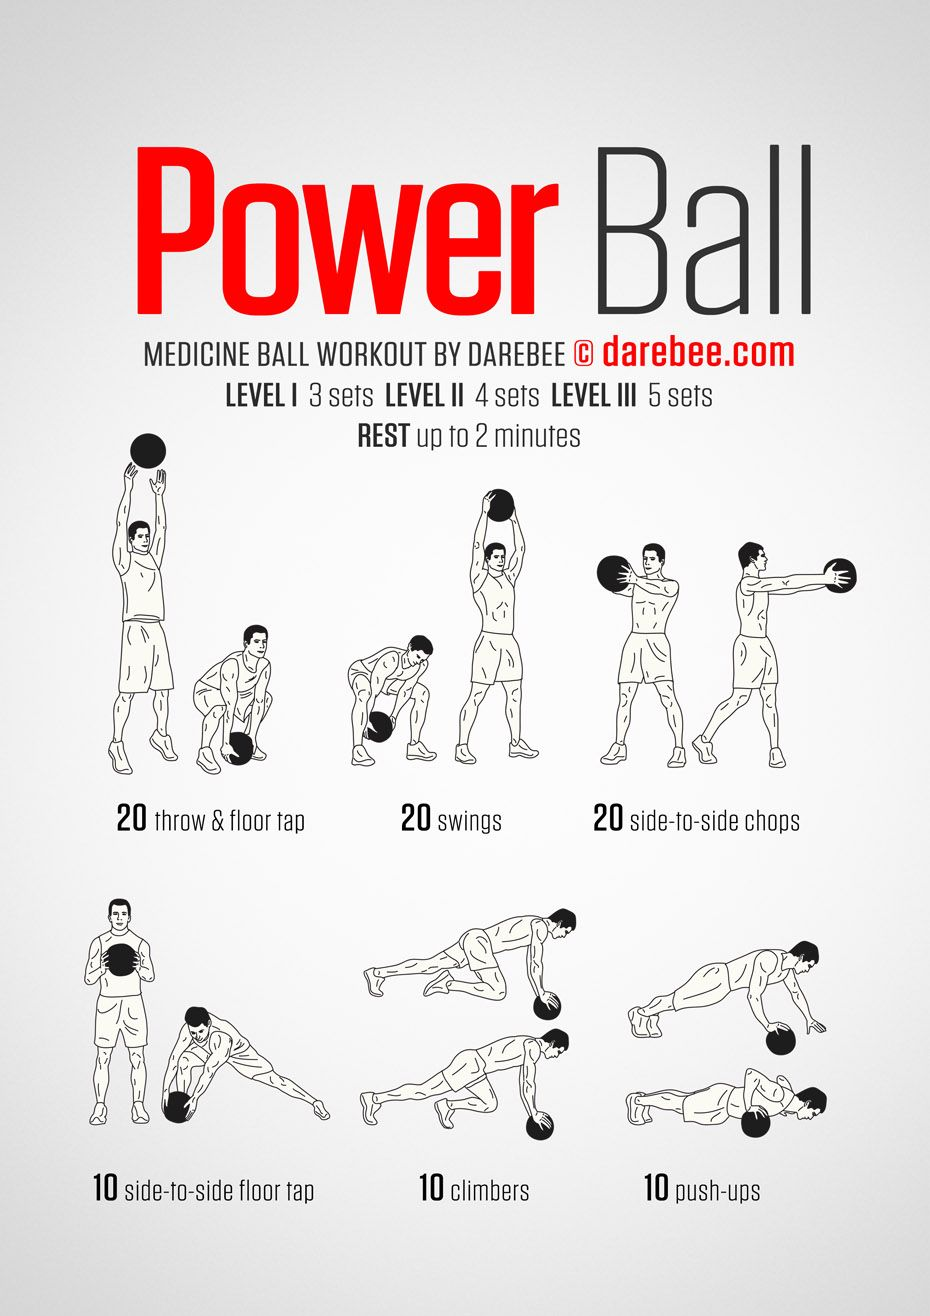 Power Ball Workout | Medicine ball workout, Ball exercises ...